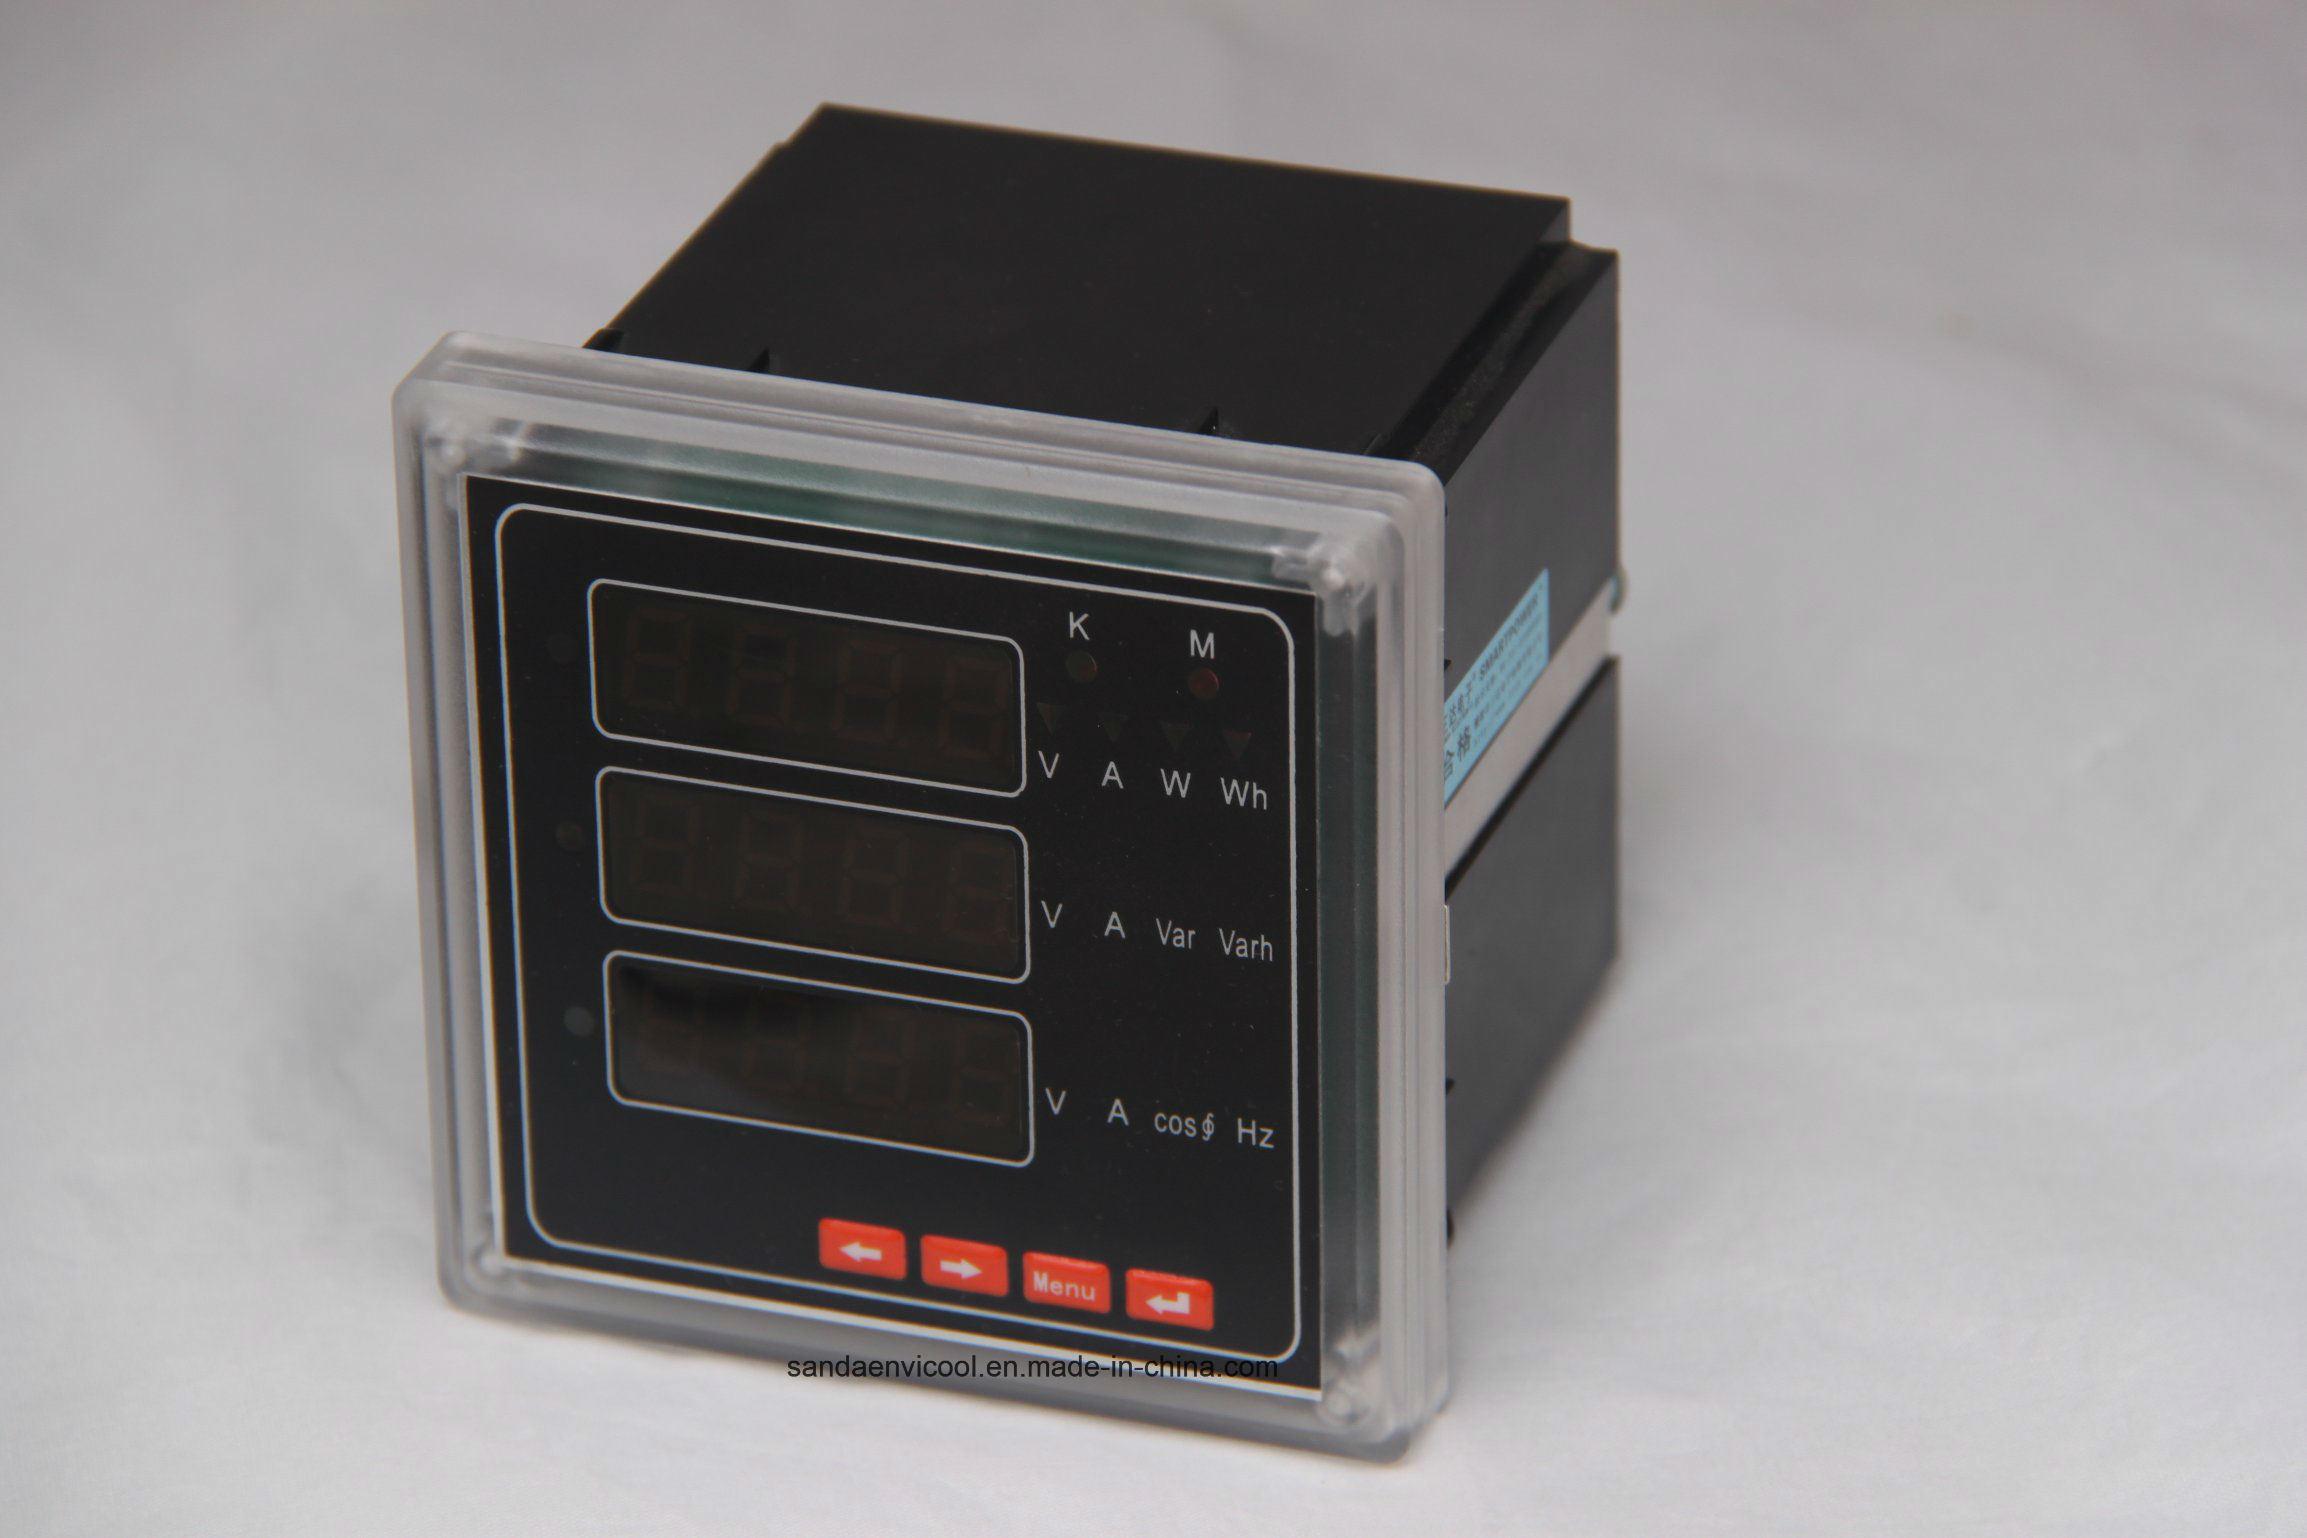 Digital Three Phase Multifunction LED Display Electric Meter RS485